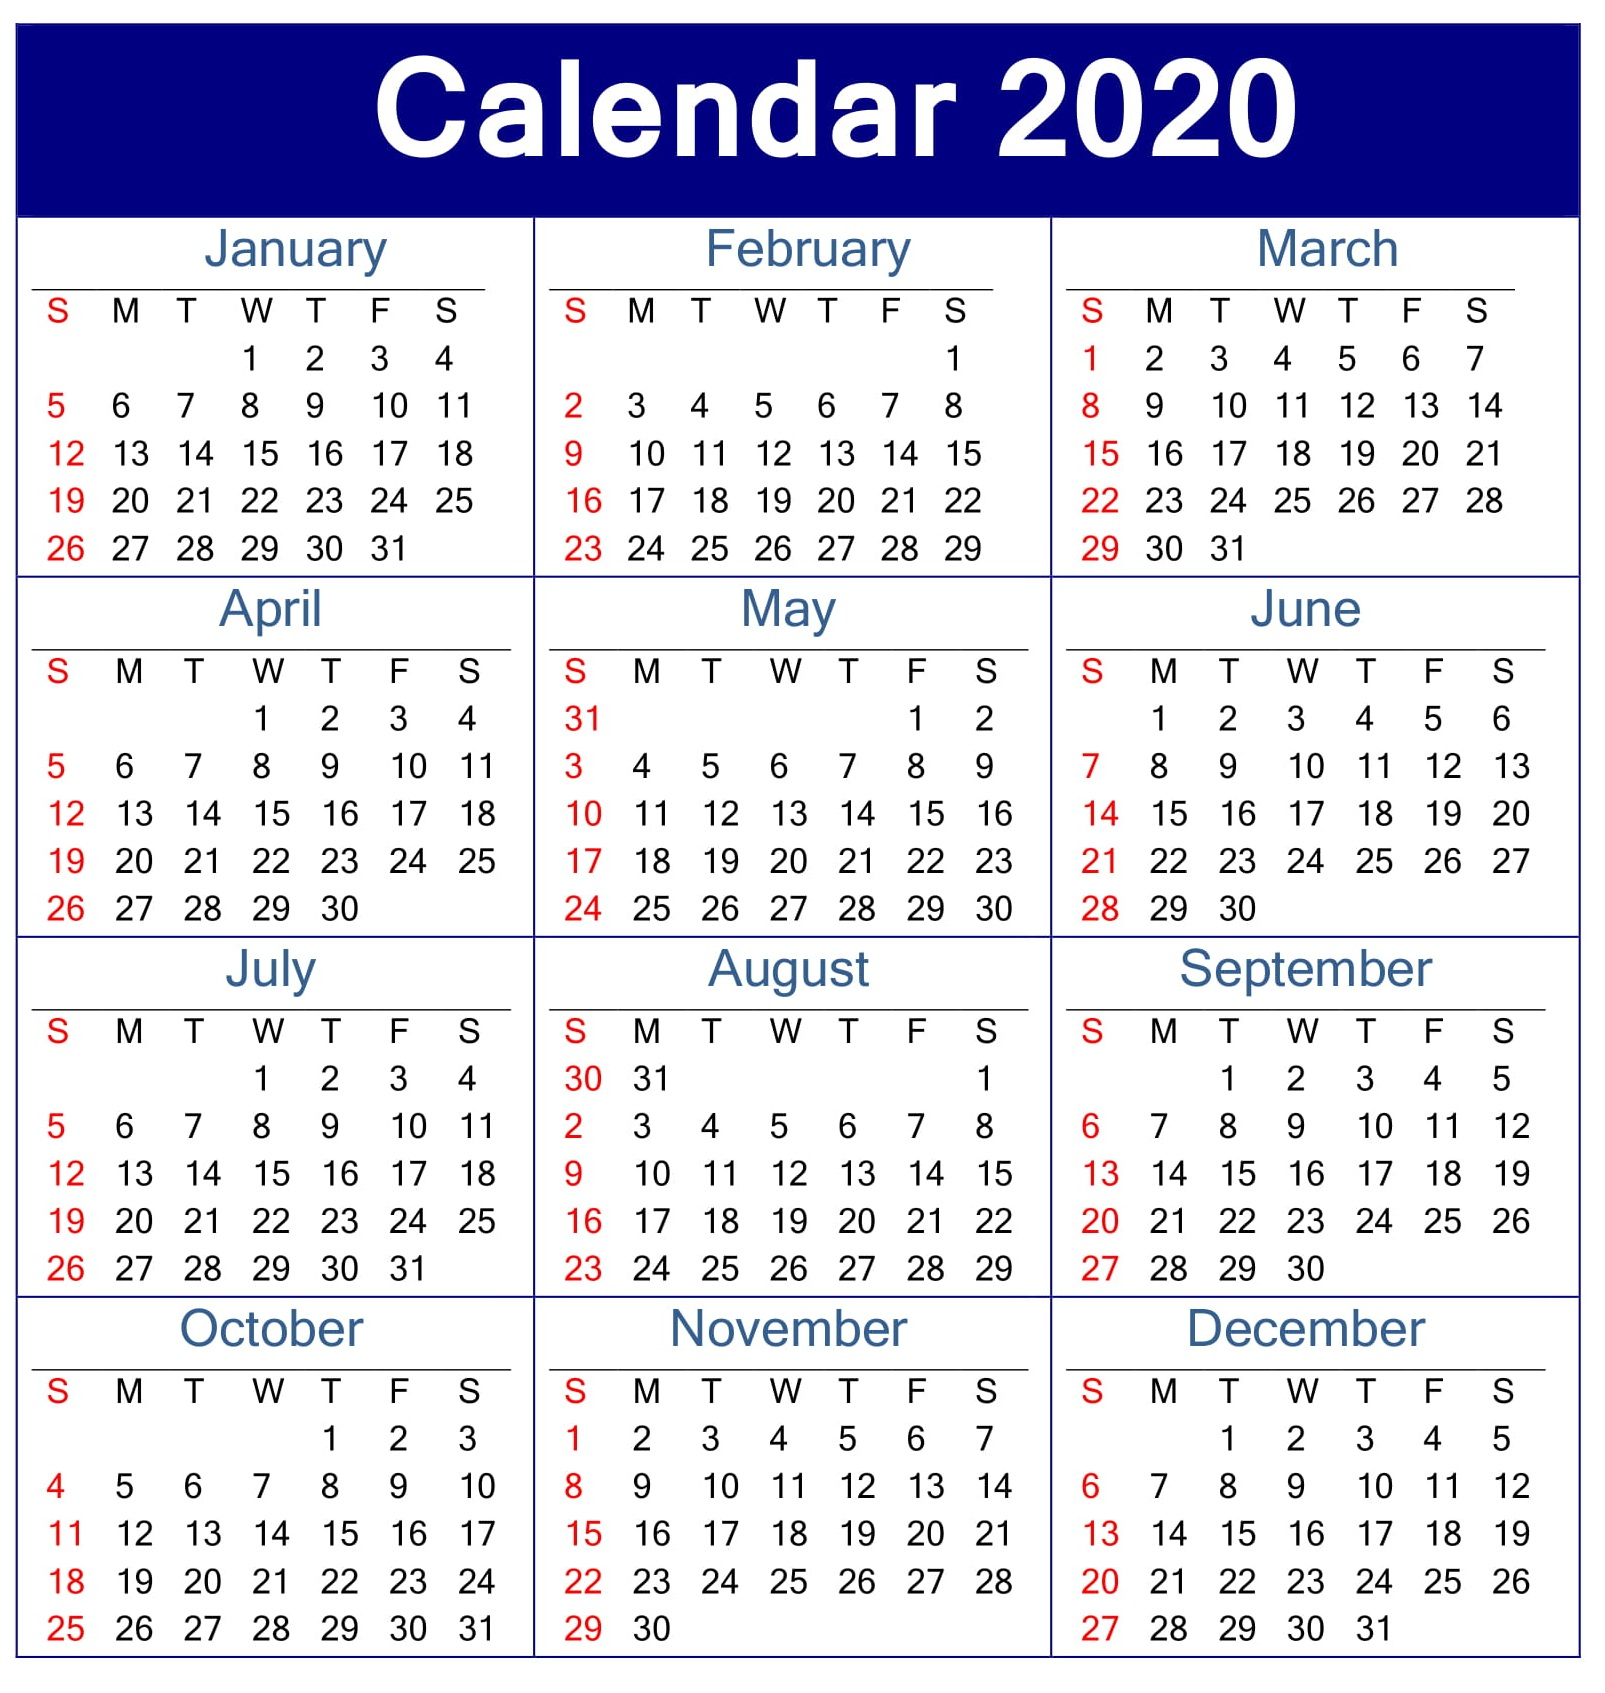 Printable Calendar 2020 Pdf Template – Free Latest Calendar inside Printable Calander 2020